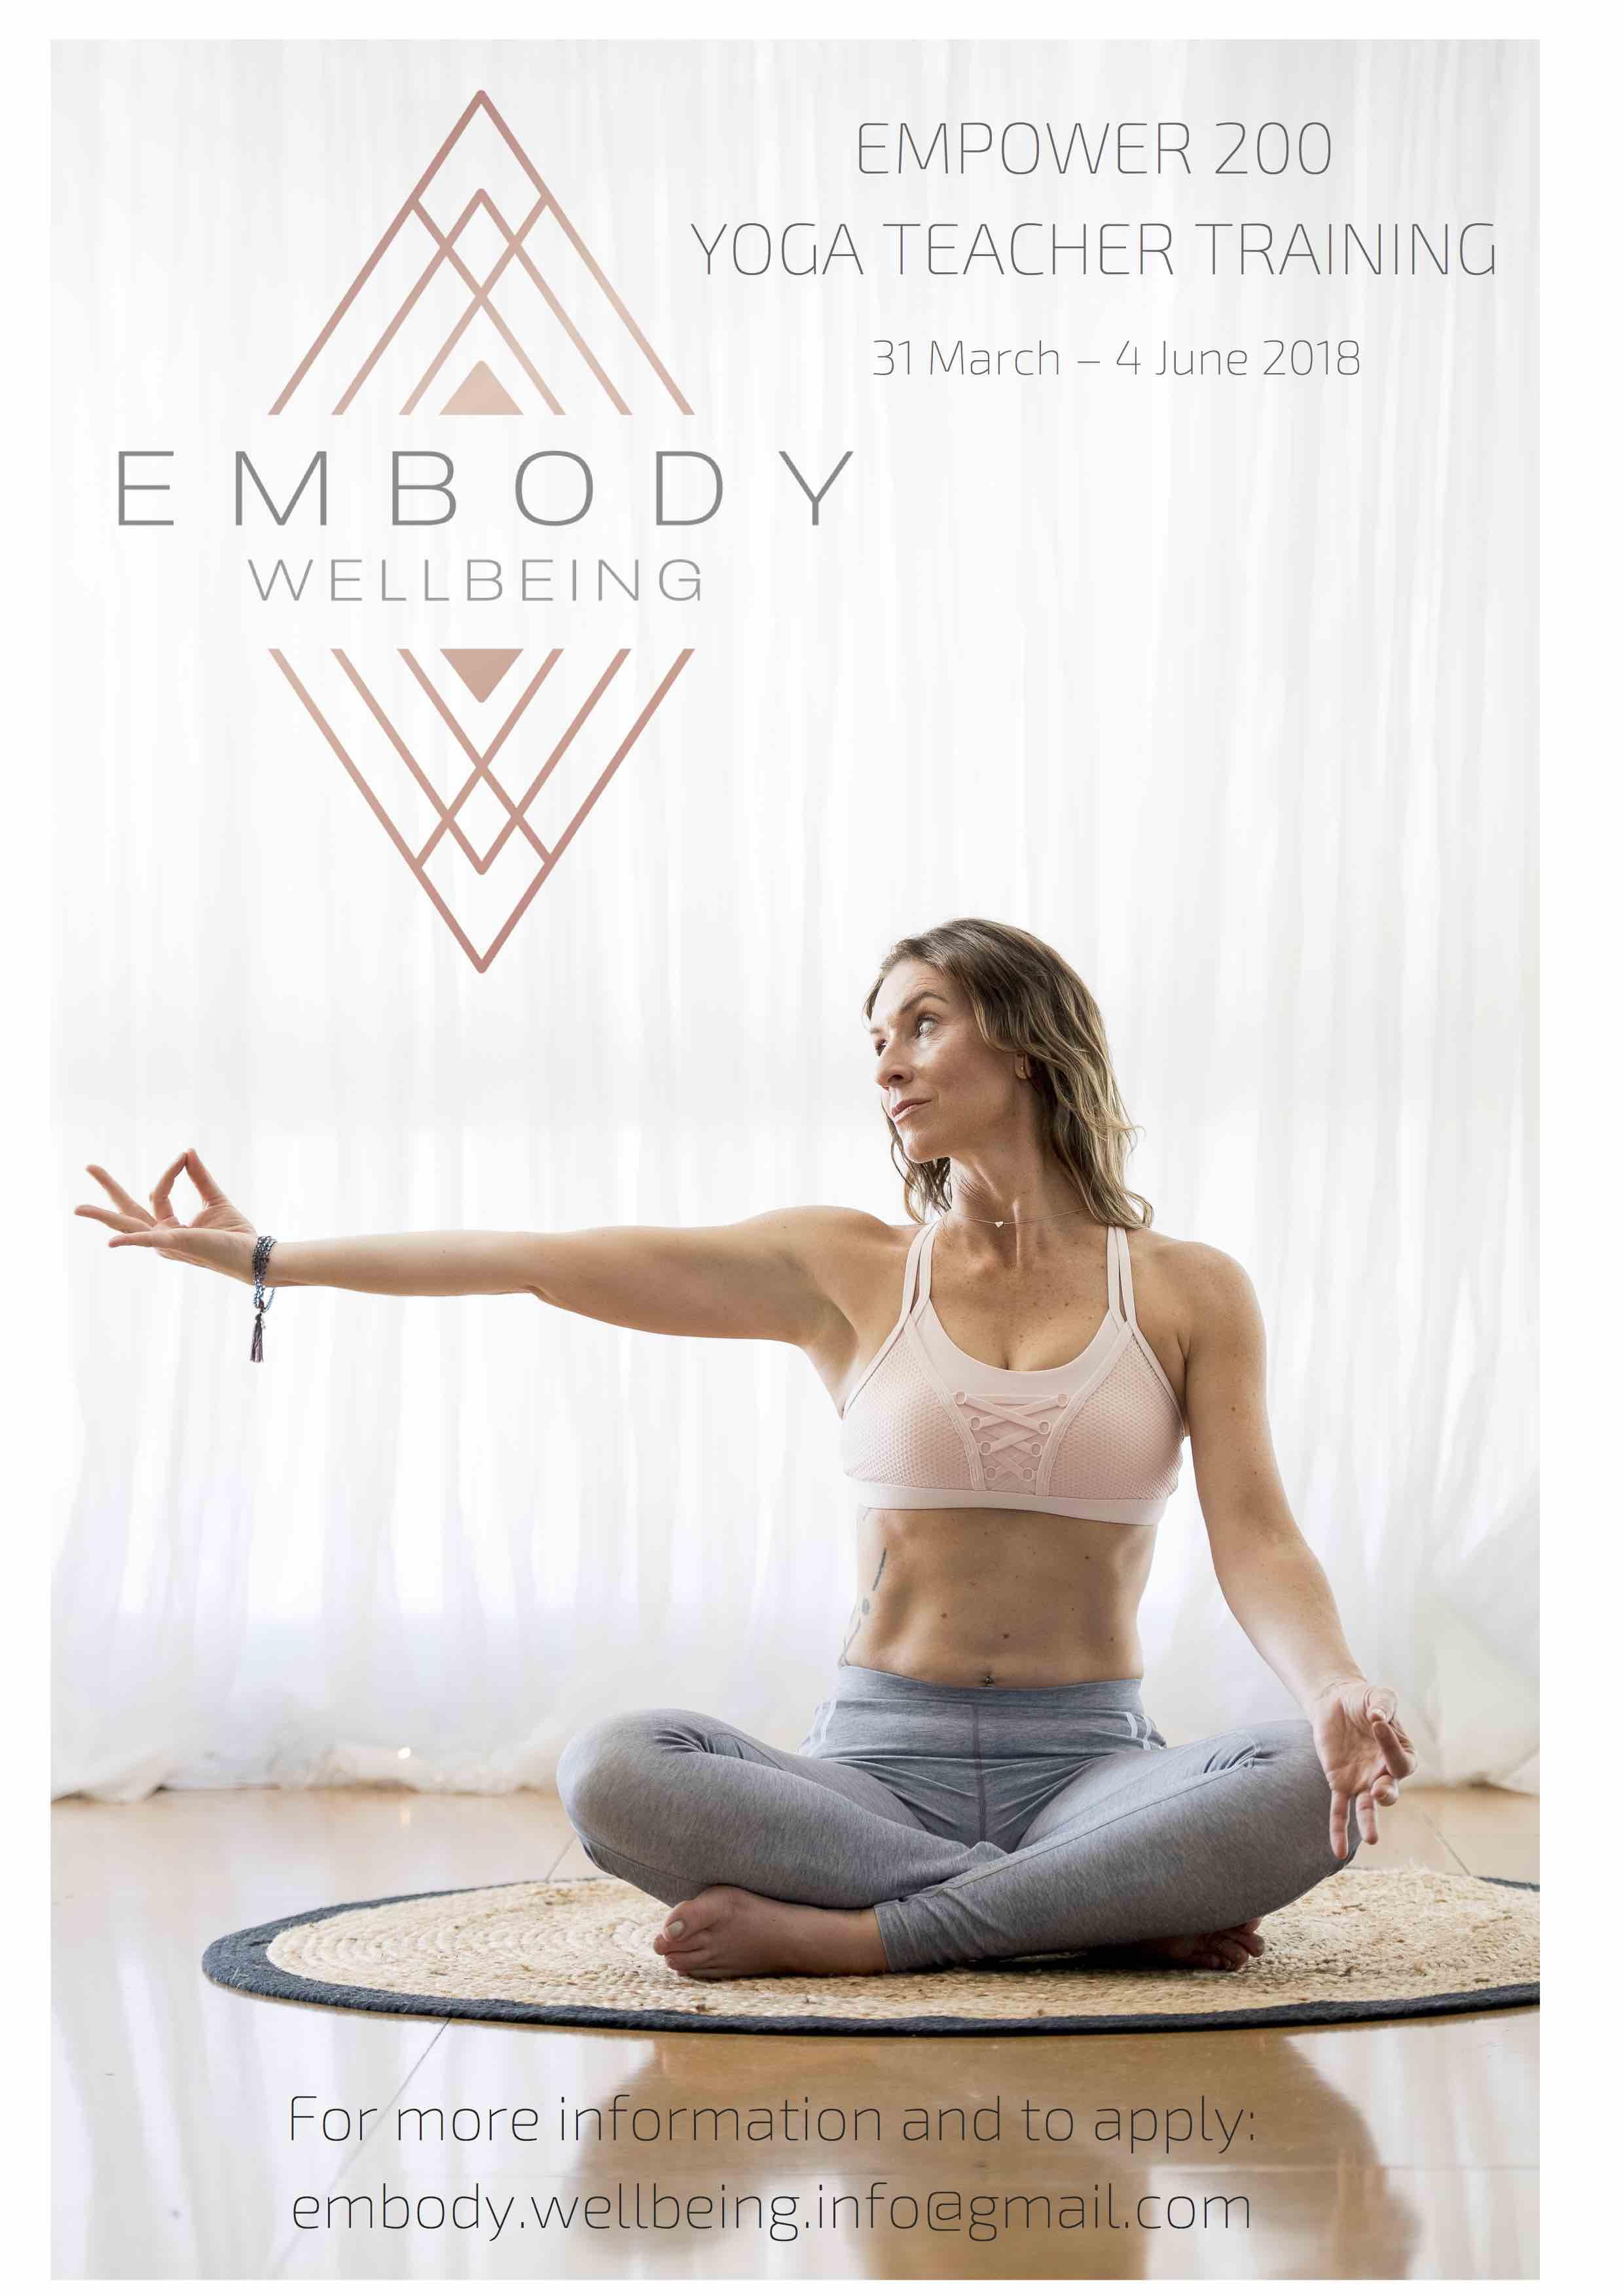 Empower 200 Yoga Teacher Training - Gymea Eco Retreat & Spa